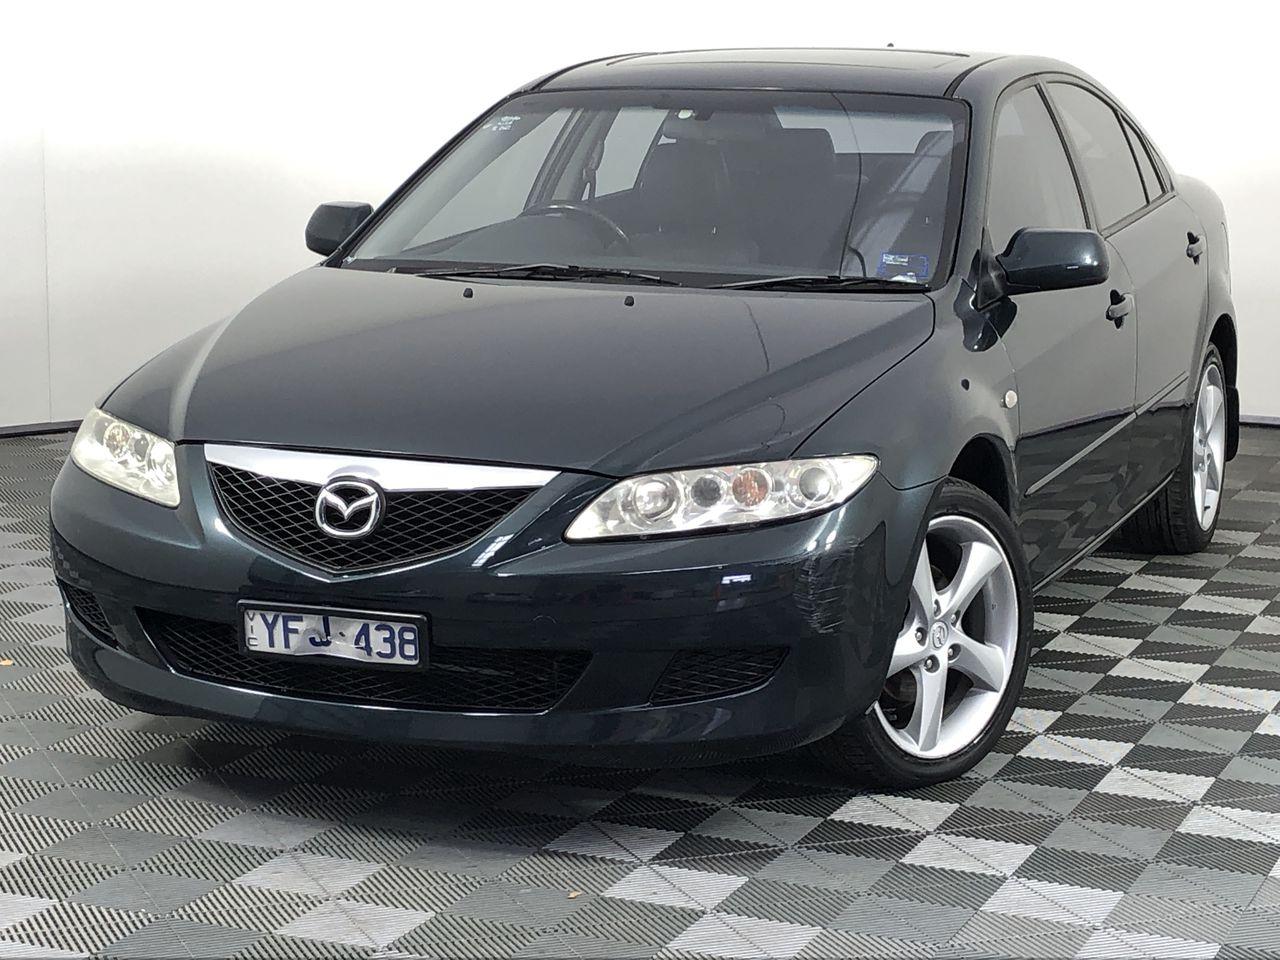 2004 Mazda 6 Luxury GG Automatic Hatchback